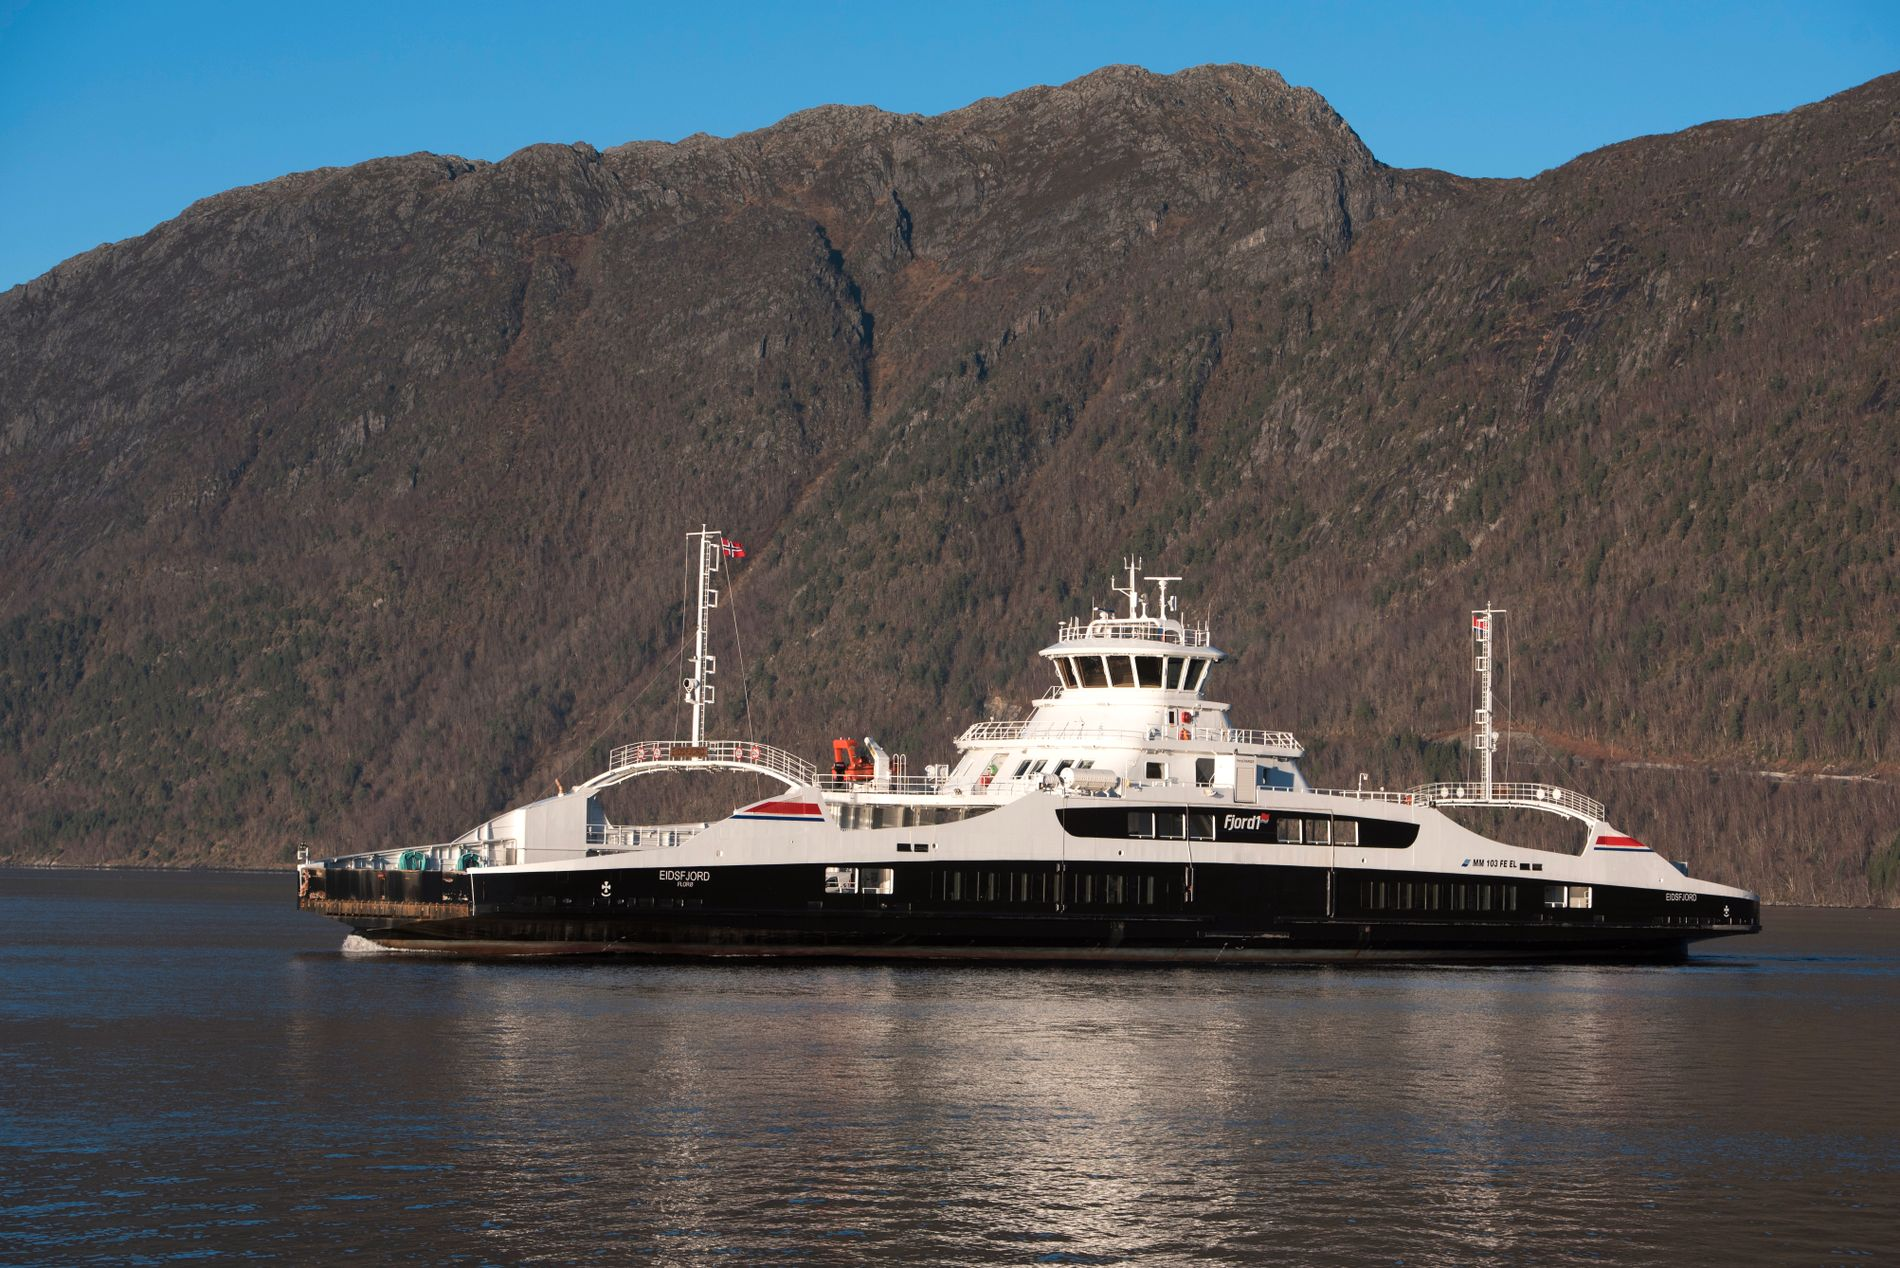 ERSTATTES MED BRO?: Den elektriske fergen «Eidsfjord», som går mellom Anda og Lote i Nordfjord.